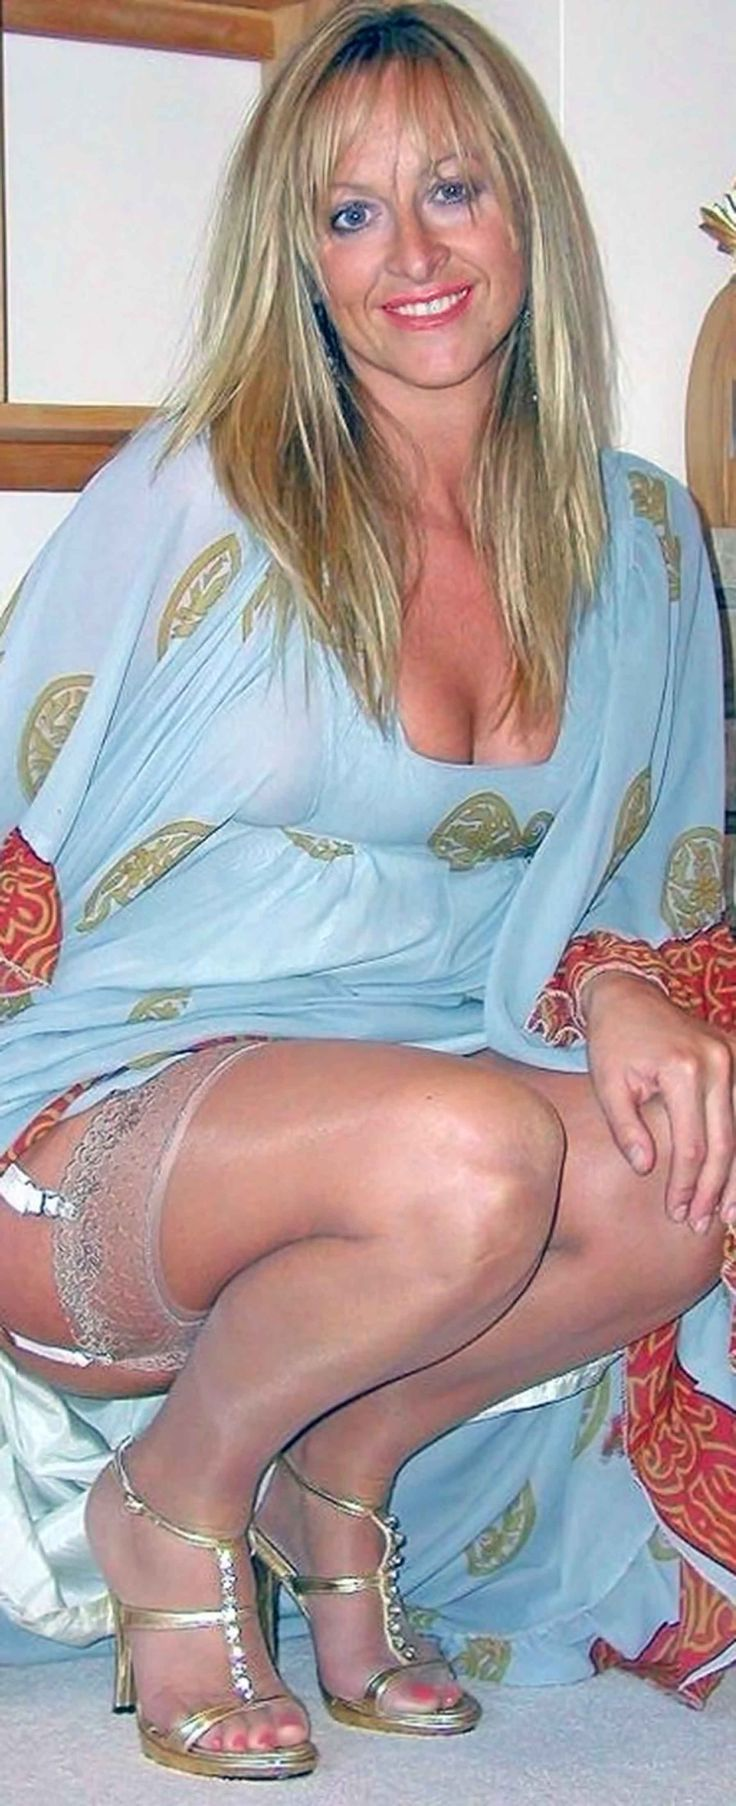 Girl pornstar pic gallery